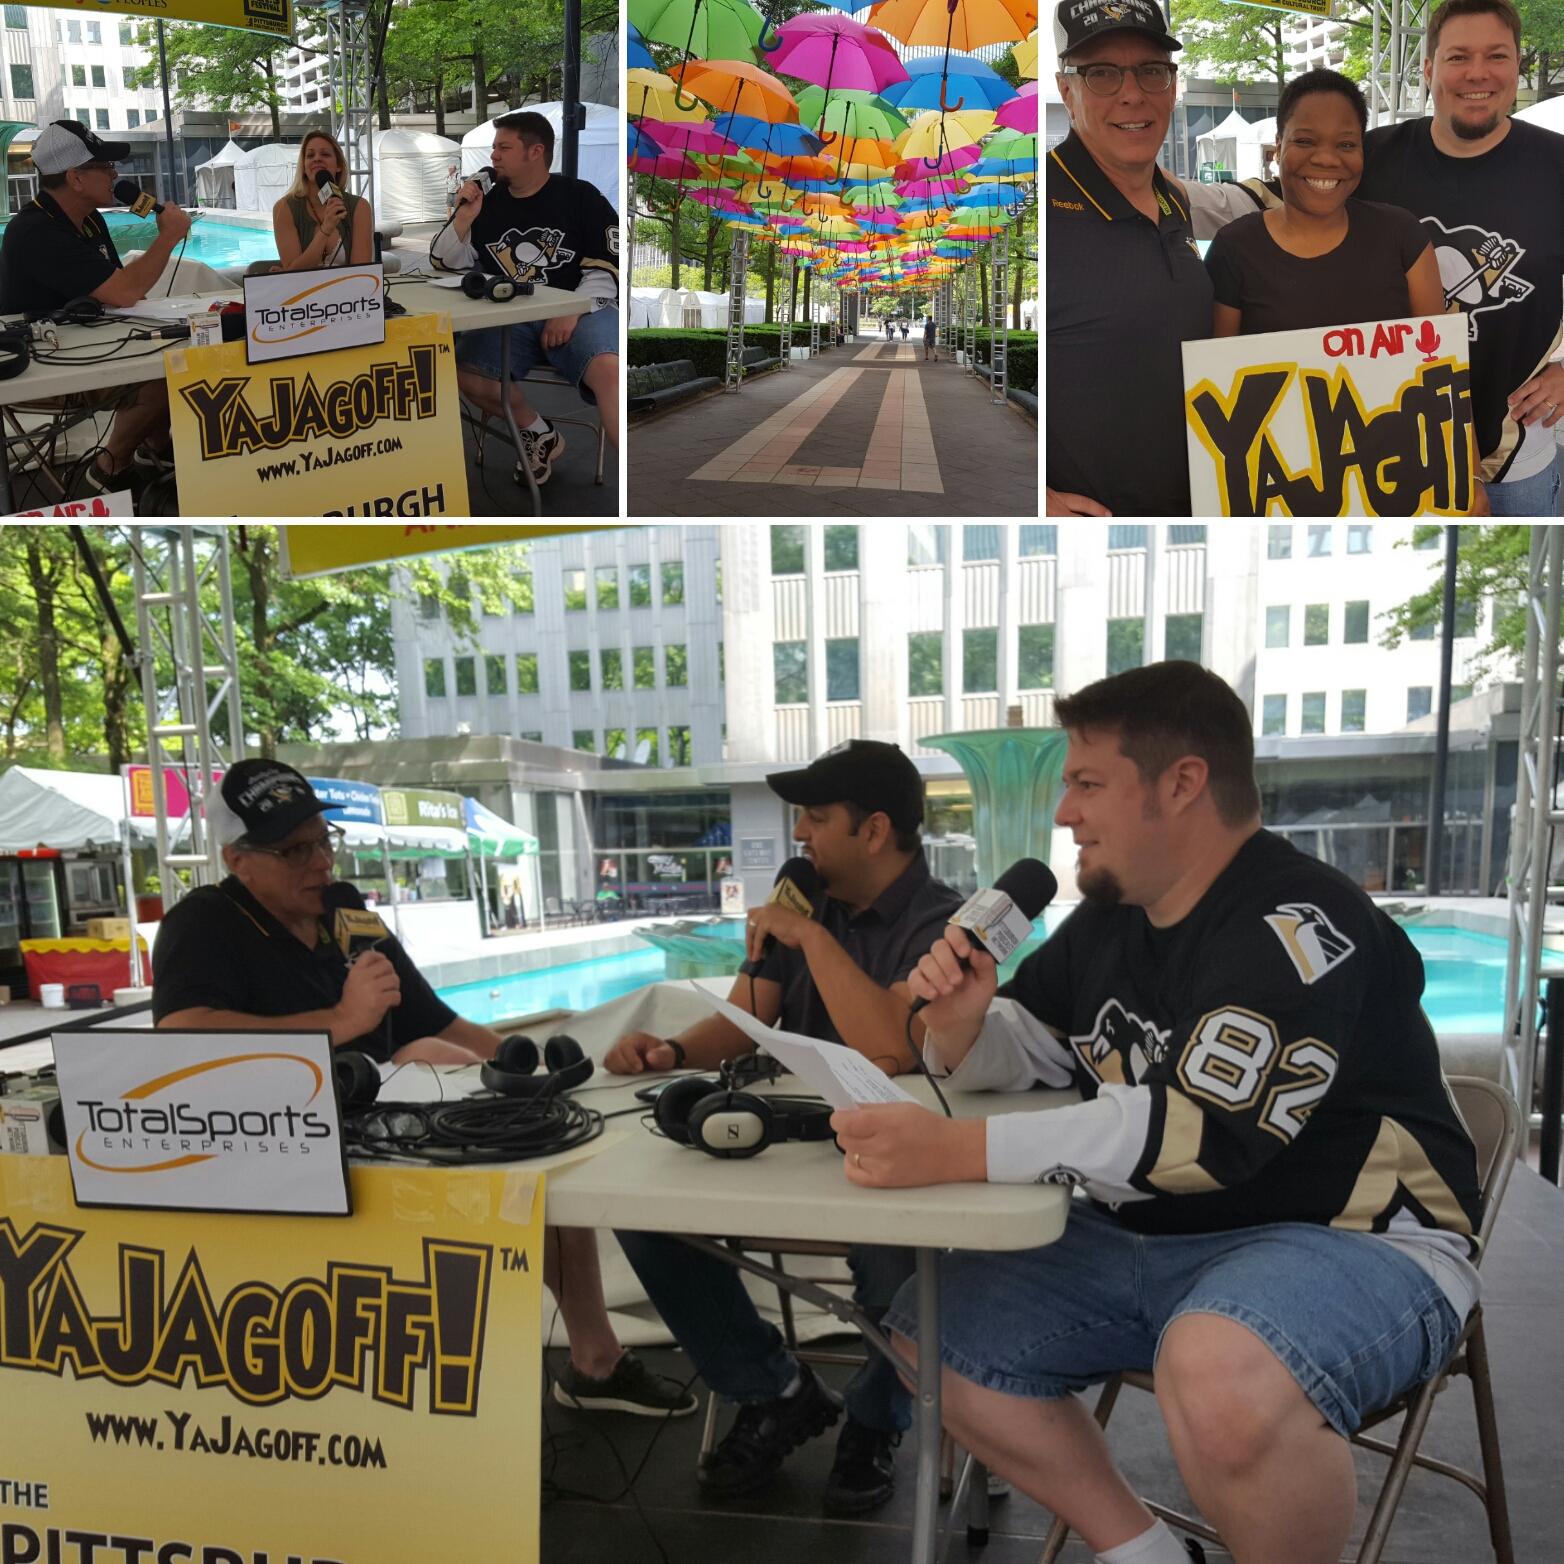 YaJagoff Podcast, 3 Rivers Arts Festival, Pittsburgh, Jagoff, YaJagoff, Douglas Derda, Should I Drink That, Yinz Love BBQ,